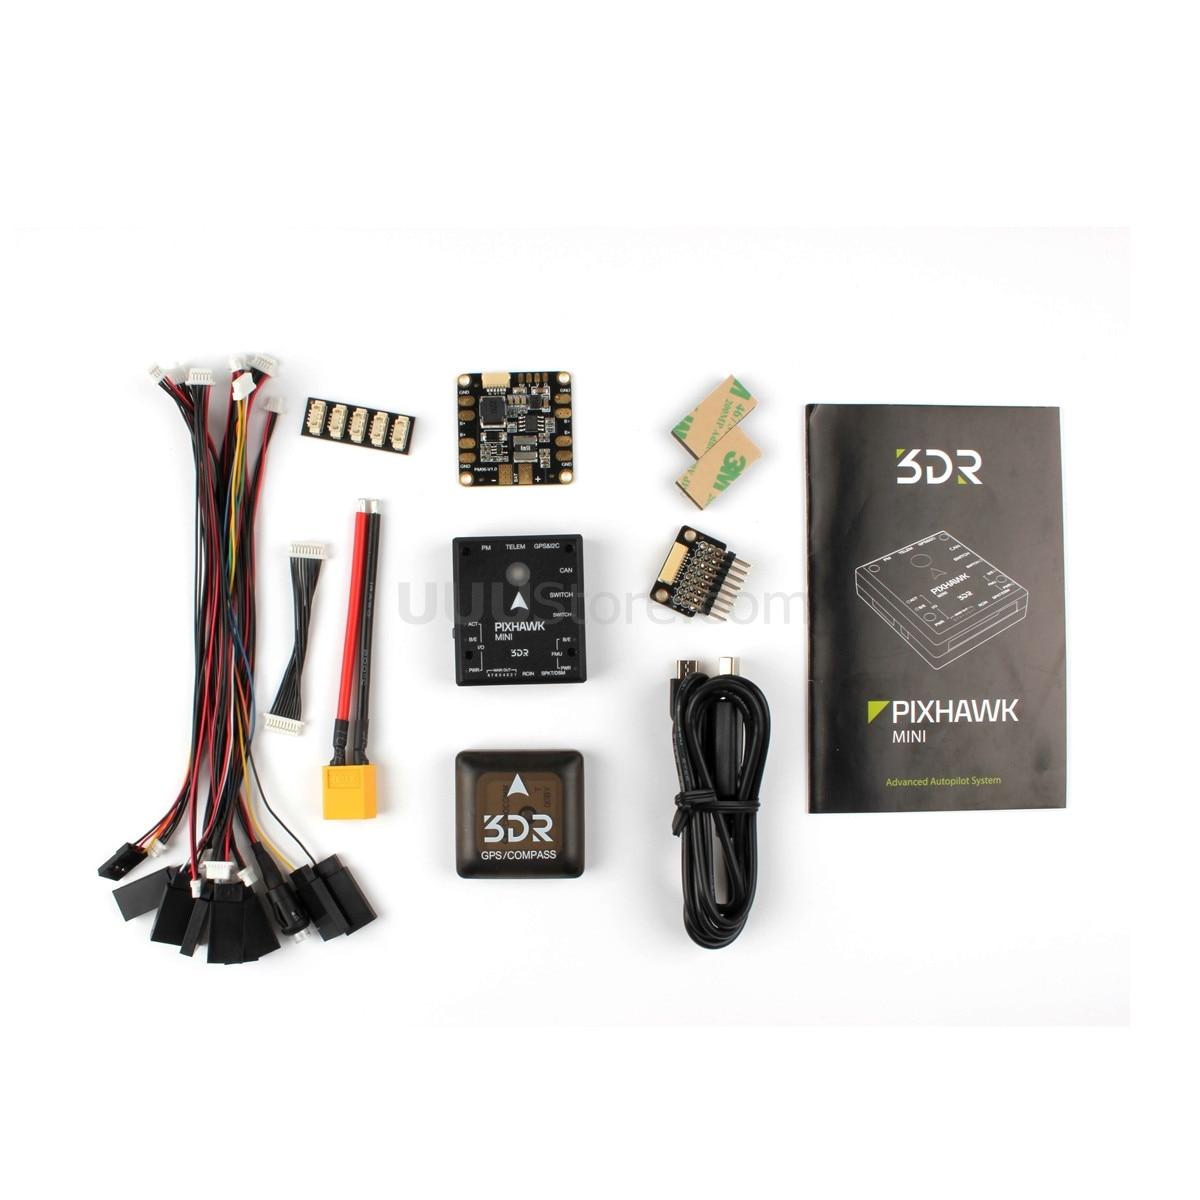 HolyBro 3DR Pixhawk Mini Autopilot & Micro M8N GPS Built-in Com pass & PDB Board Flight Controller for RC FPV Drone(China)